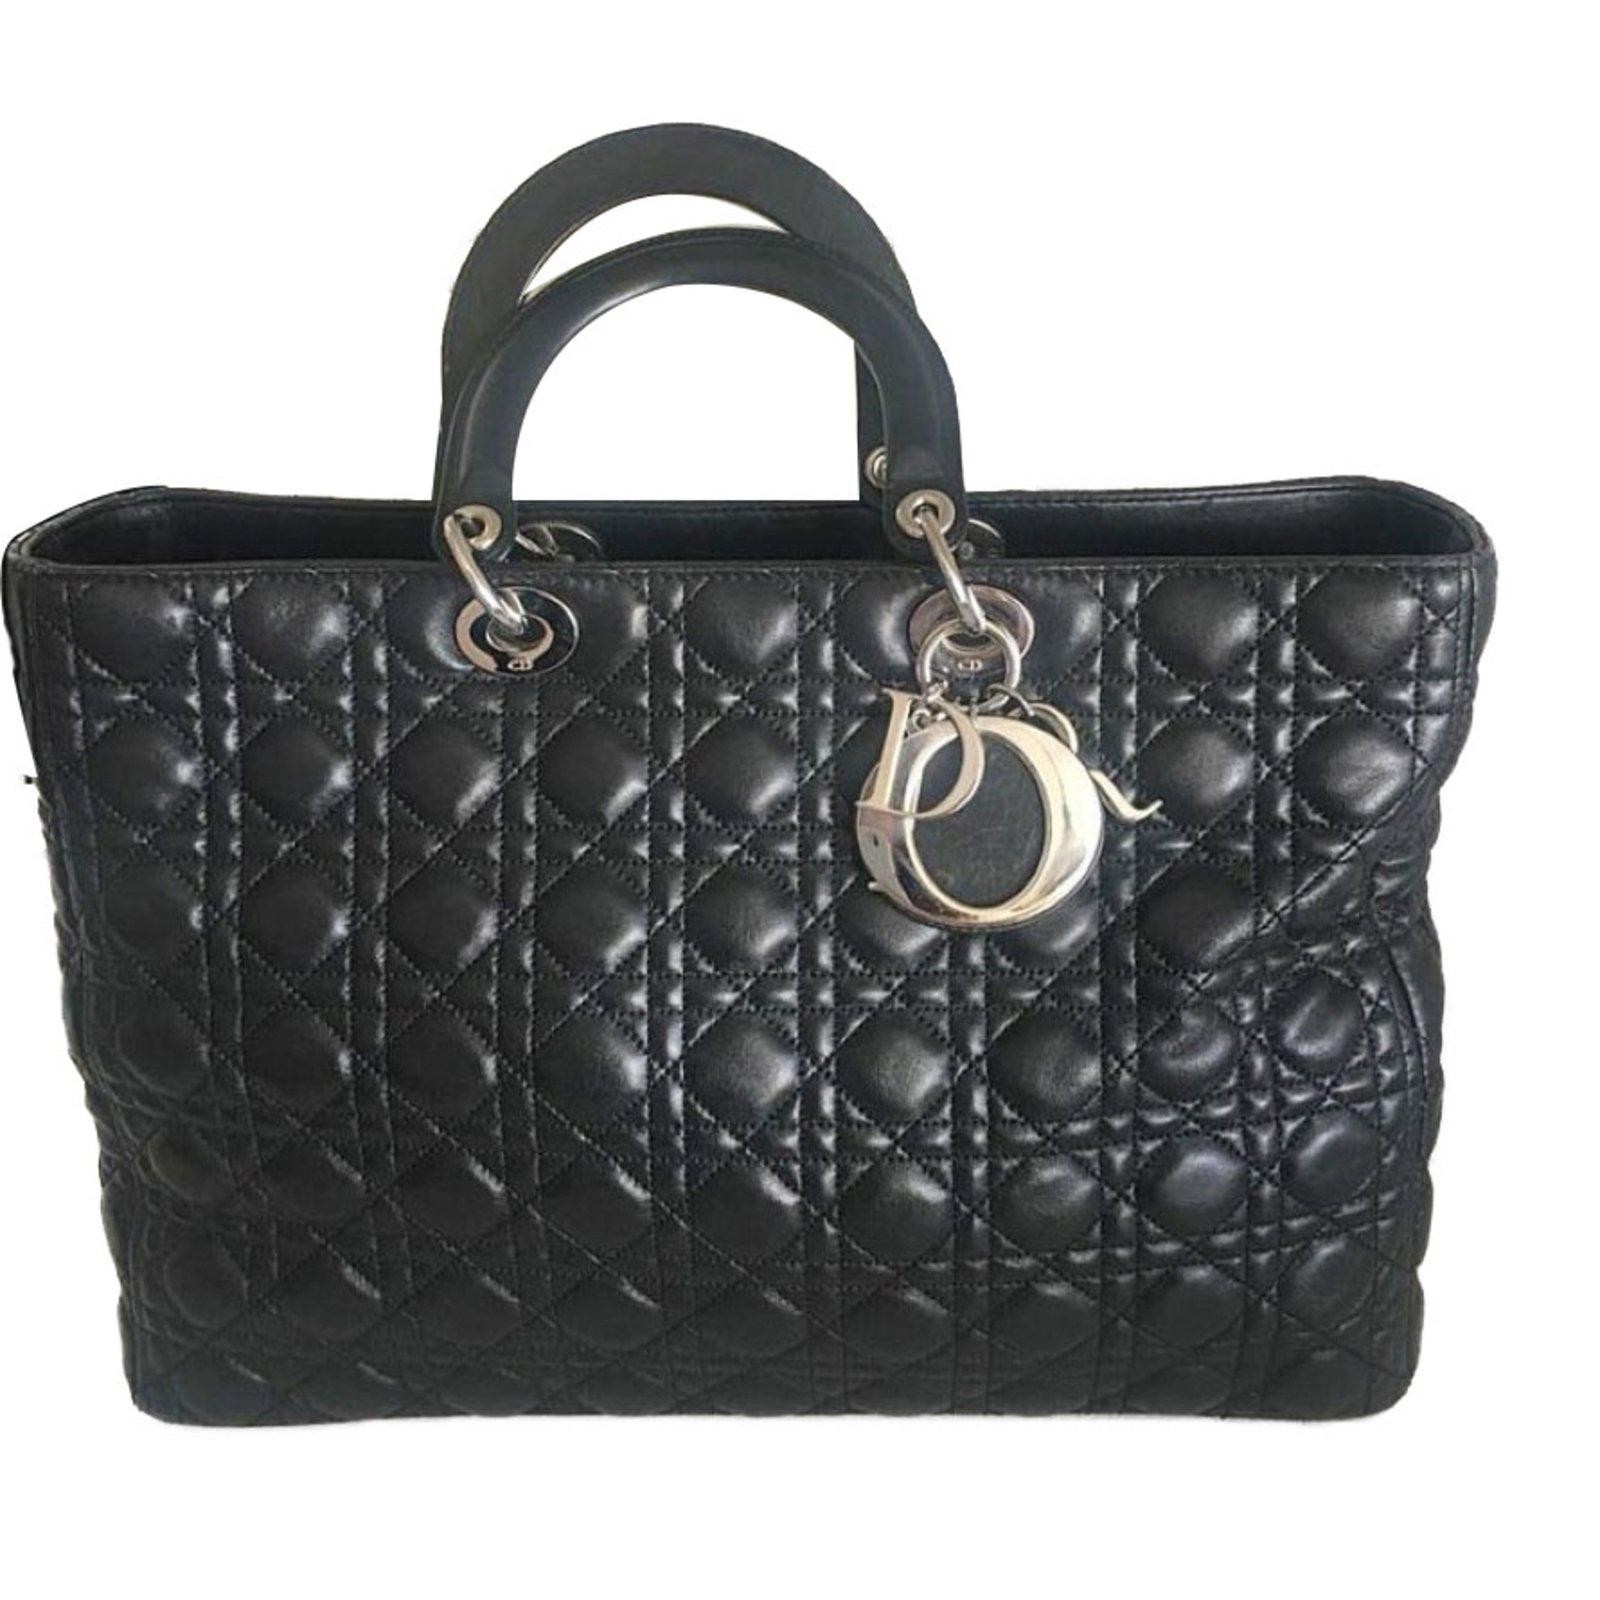 5063b00fb2f1 Sacs à main Dior Lady Dior Cuir Noir ref.66791 - Joli Closet